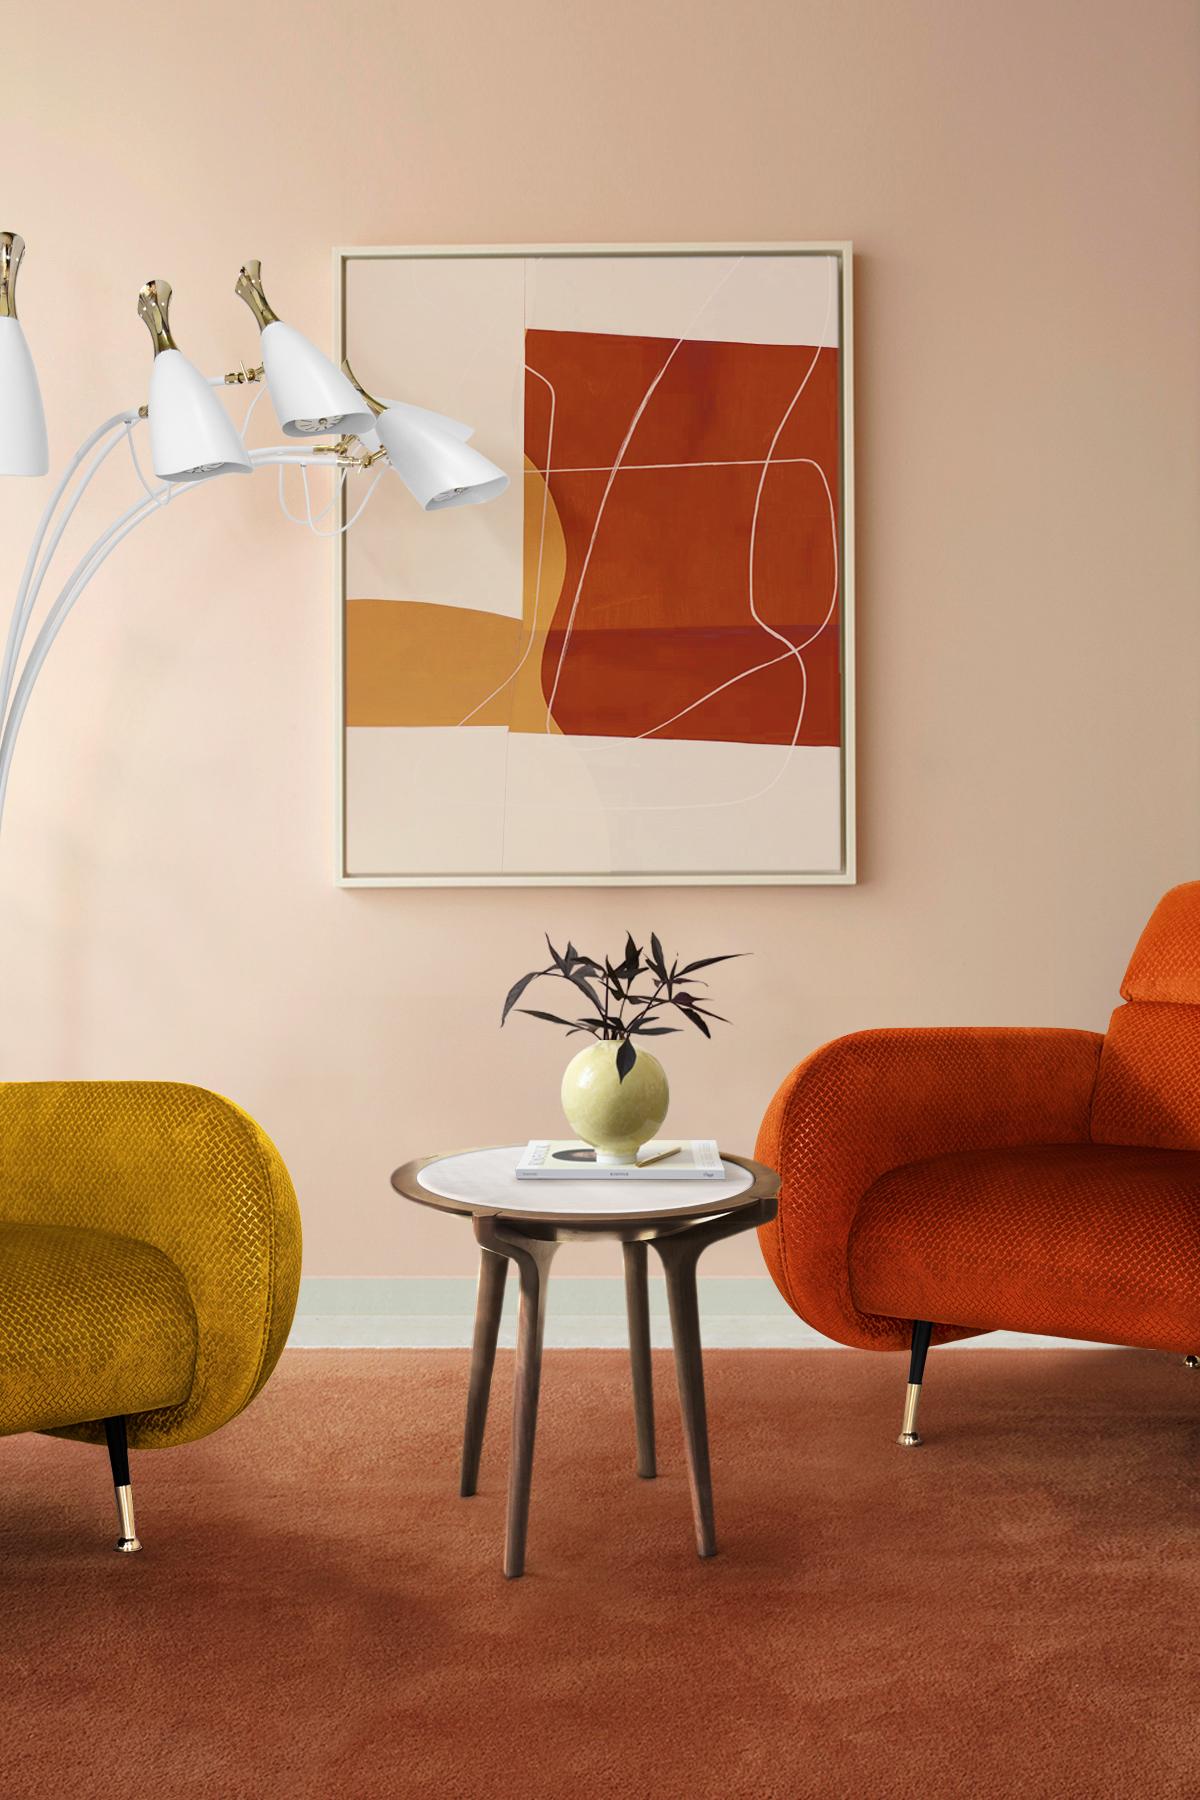 Essential-Home-Delightfull-mid-century-modern-design